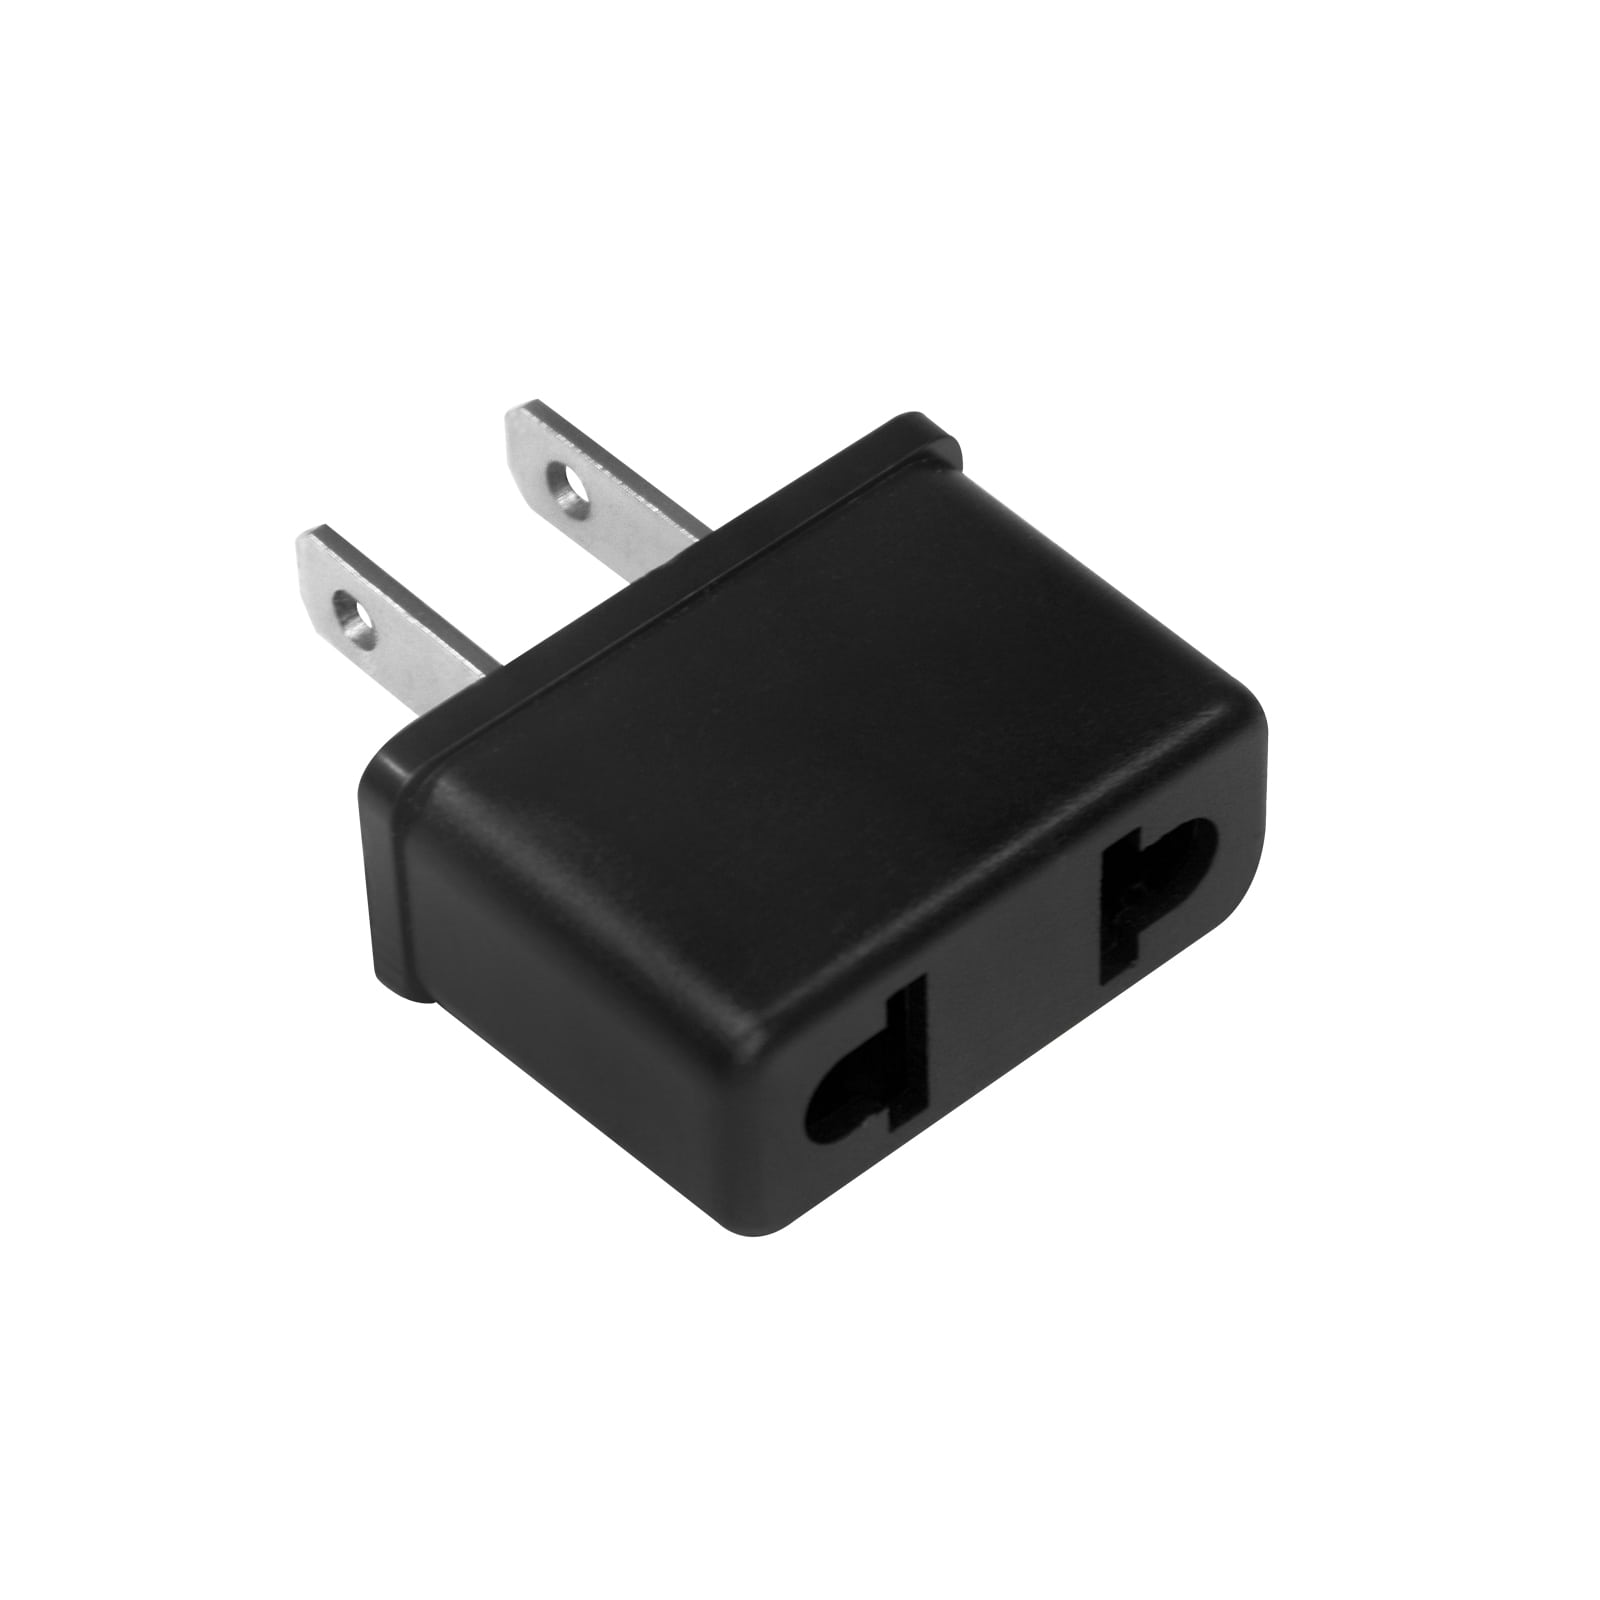 eaxus netzadapter usa us stecker 2 pin f r ger te mit euro stromstecker neu ebay. Black Bedroom Furniture Sets. Home Design Ideas